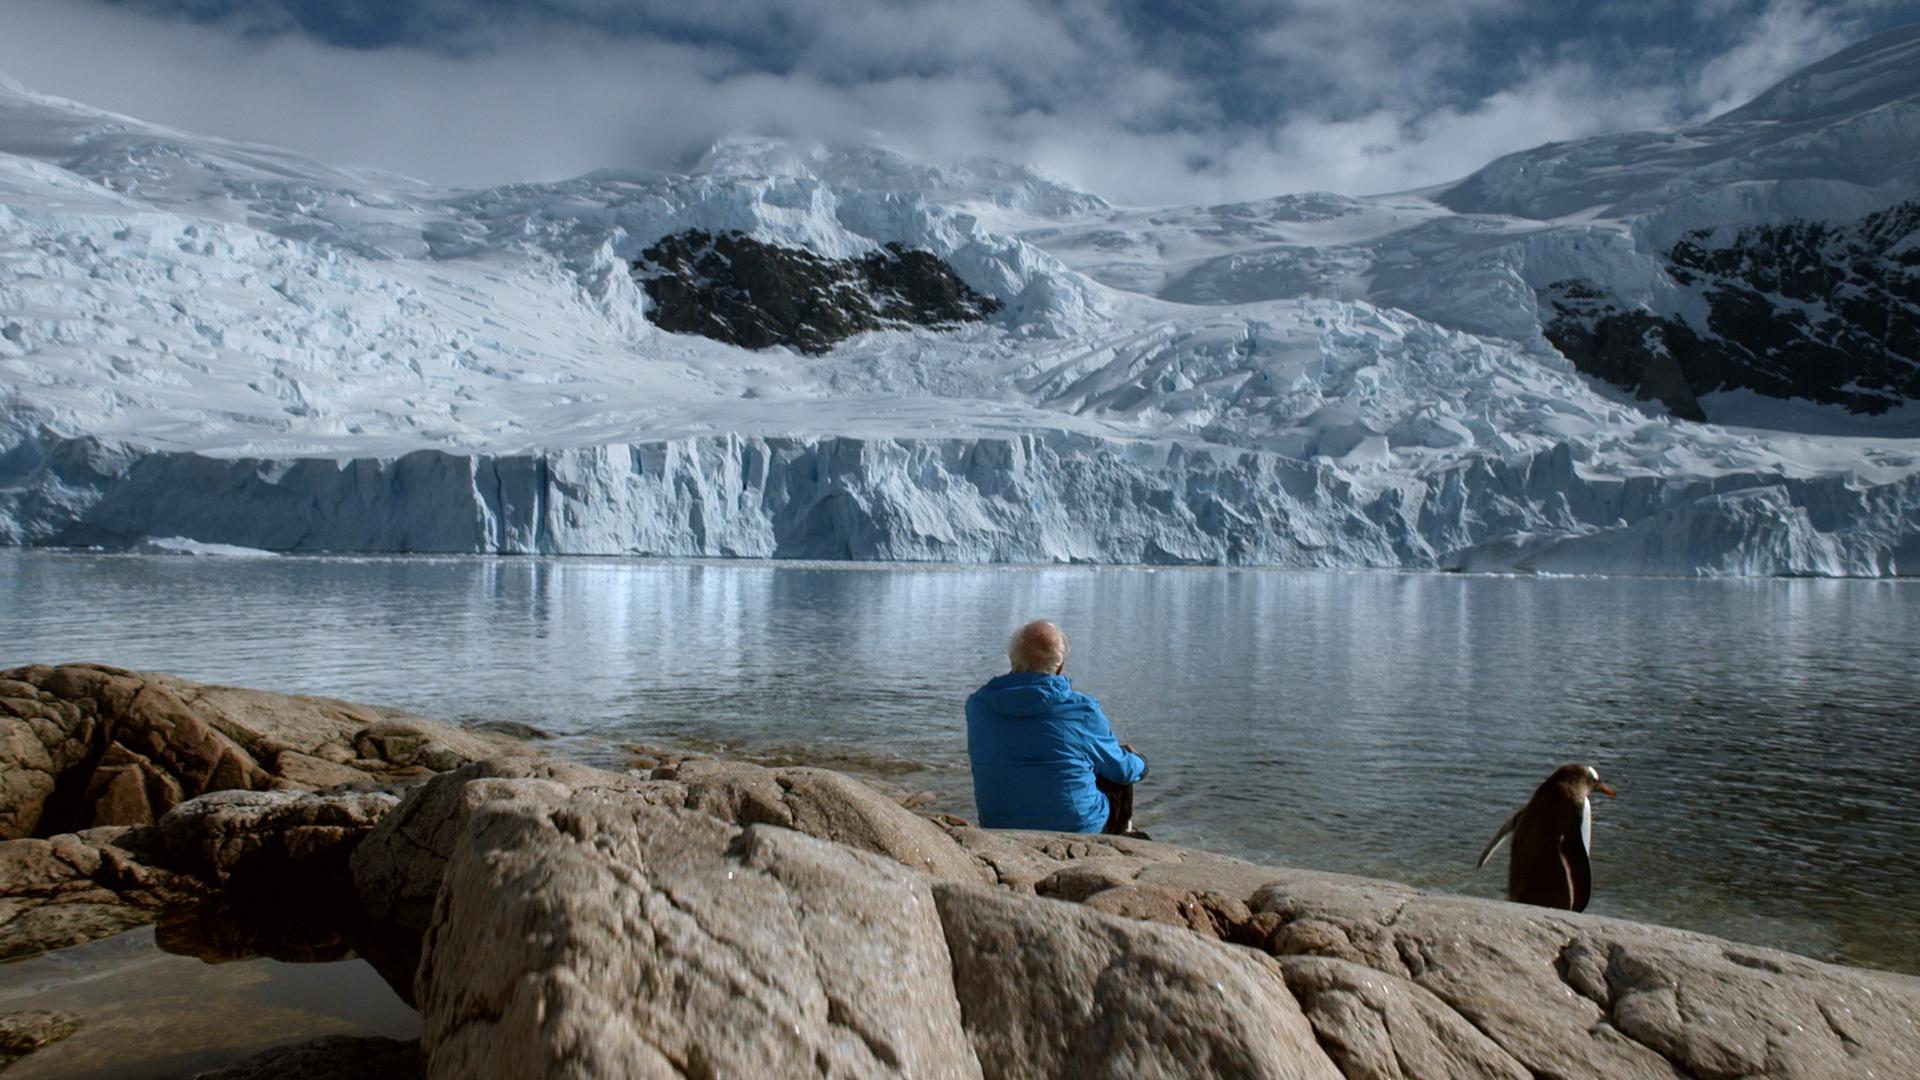 Лед и небо смотреть фото